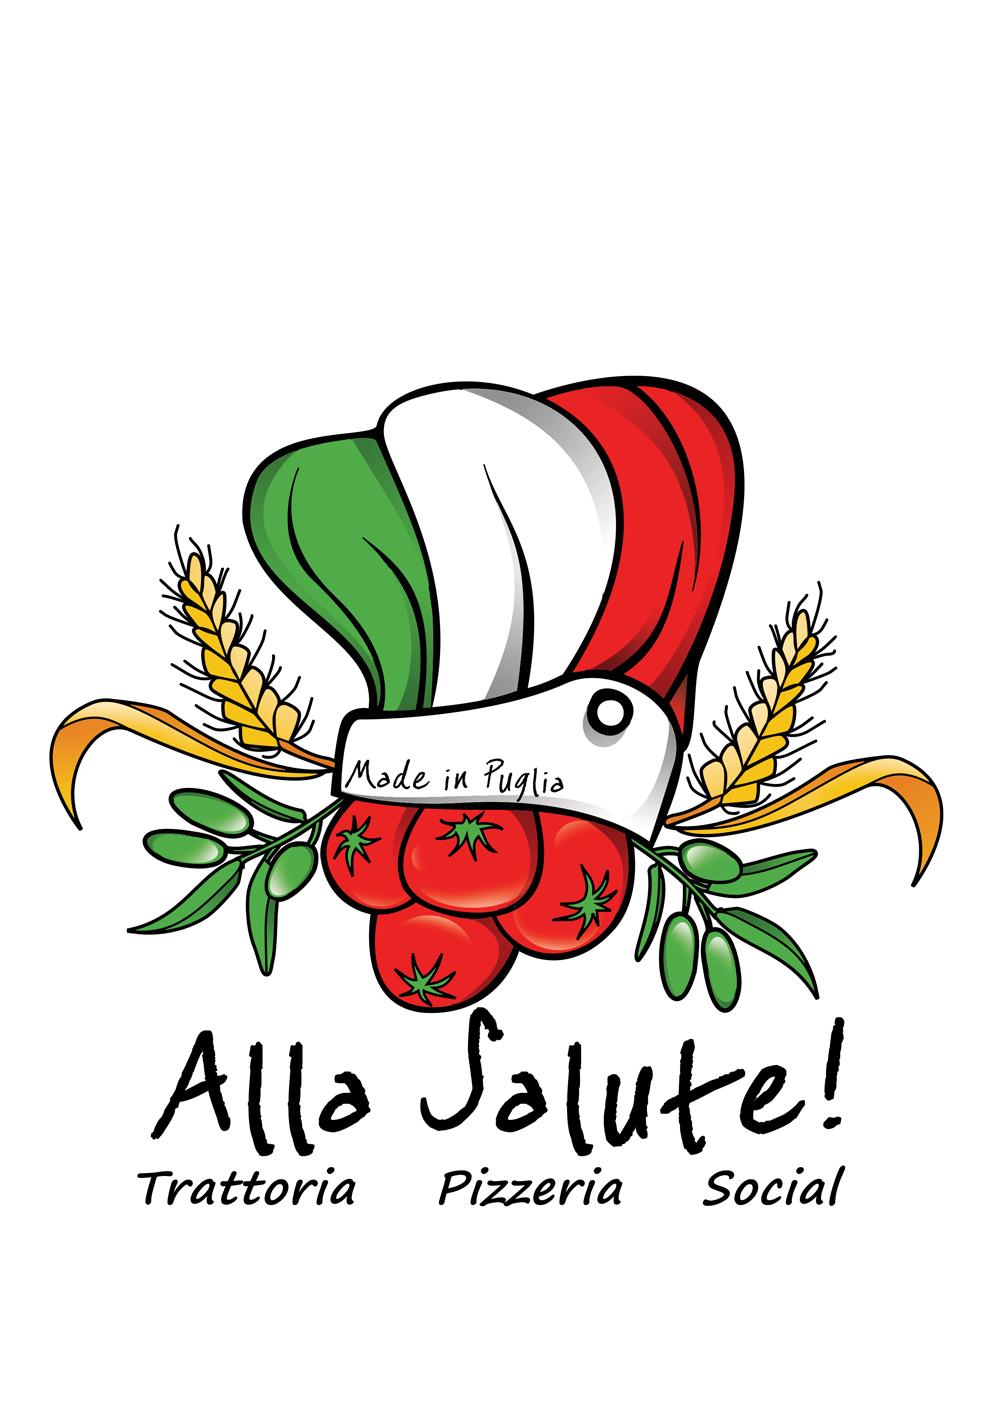 Alla salute southern pizzeria. Italy clipart restaurant italian